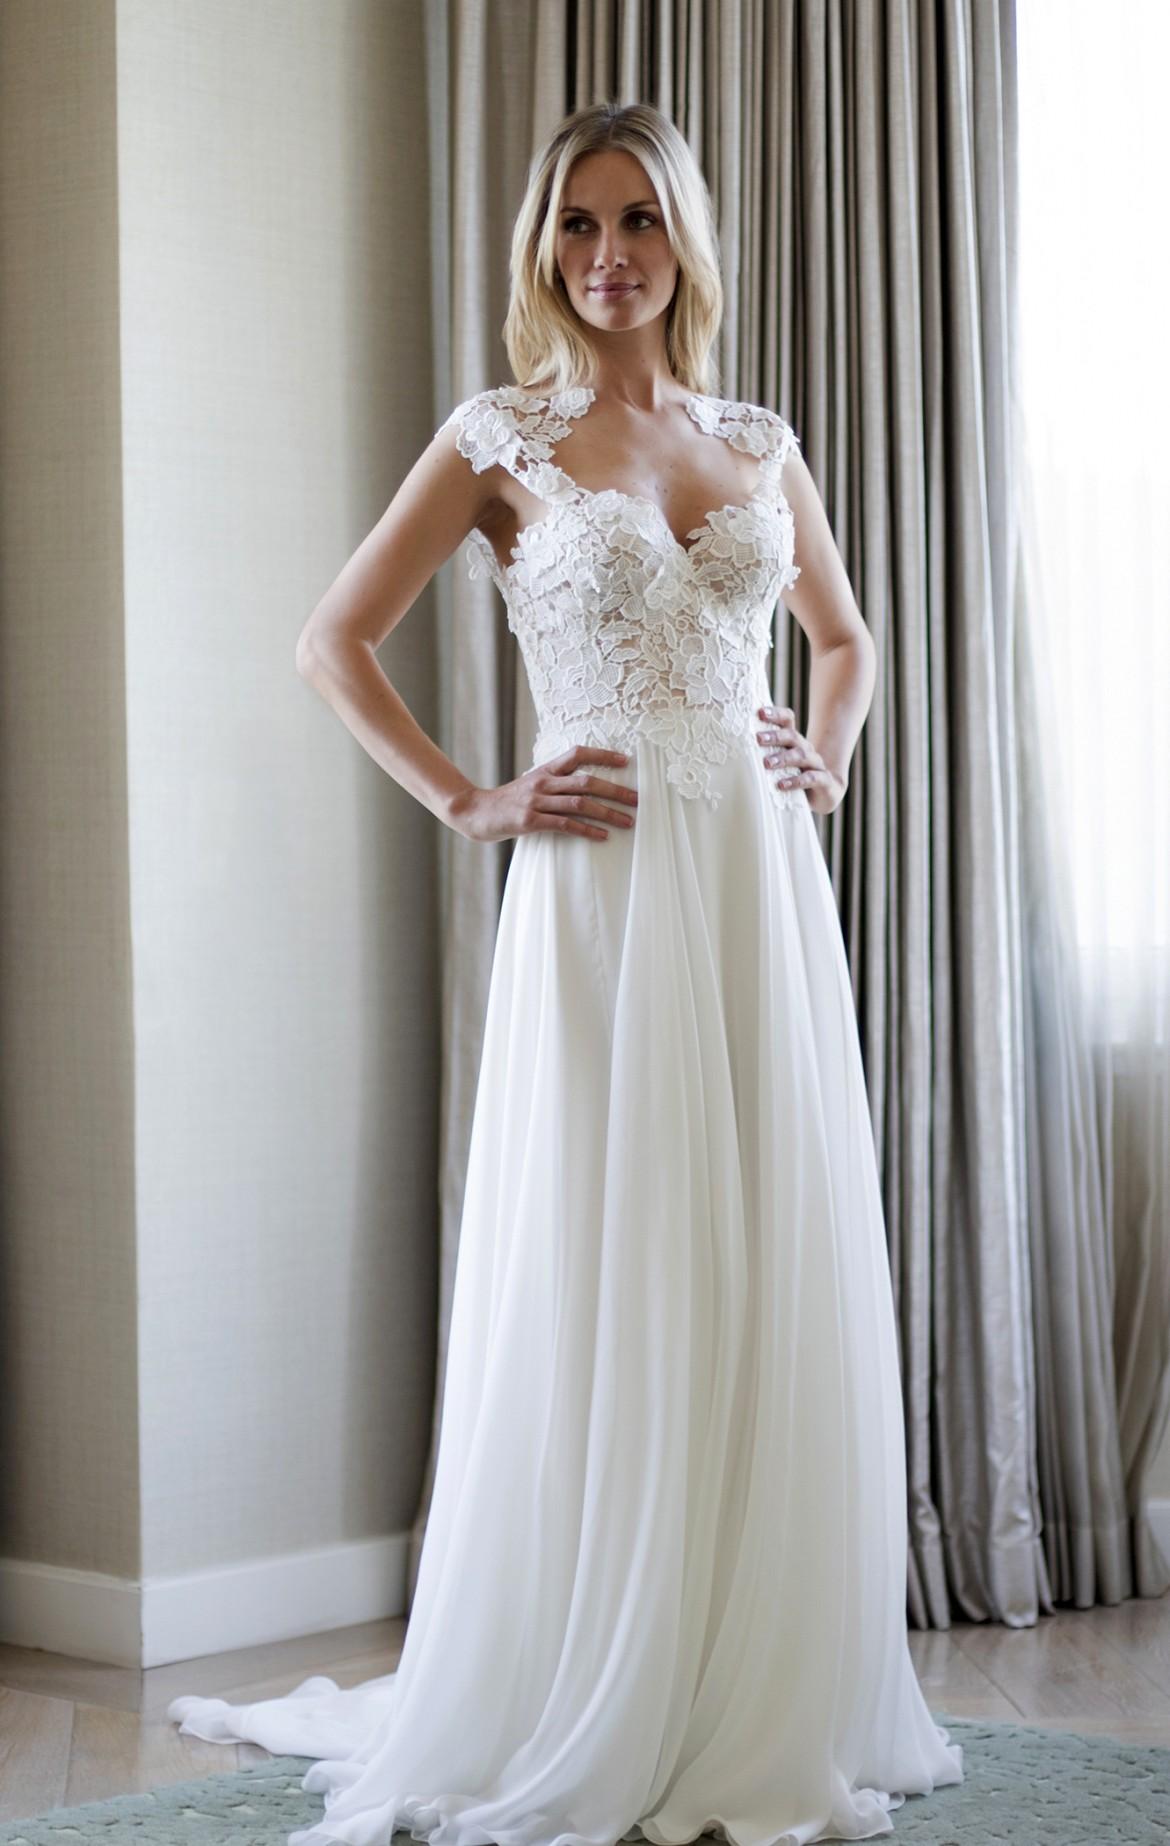 Morning designer wedding dresses by Caroline Castigliano